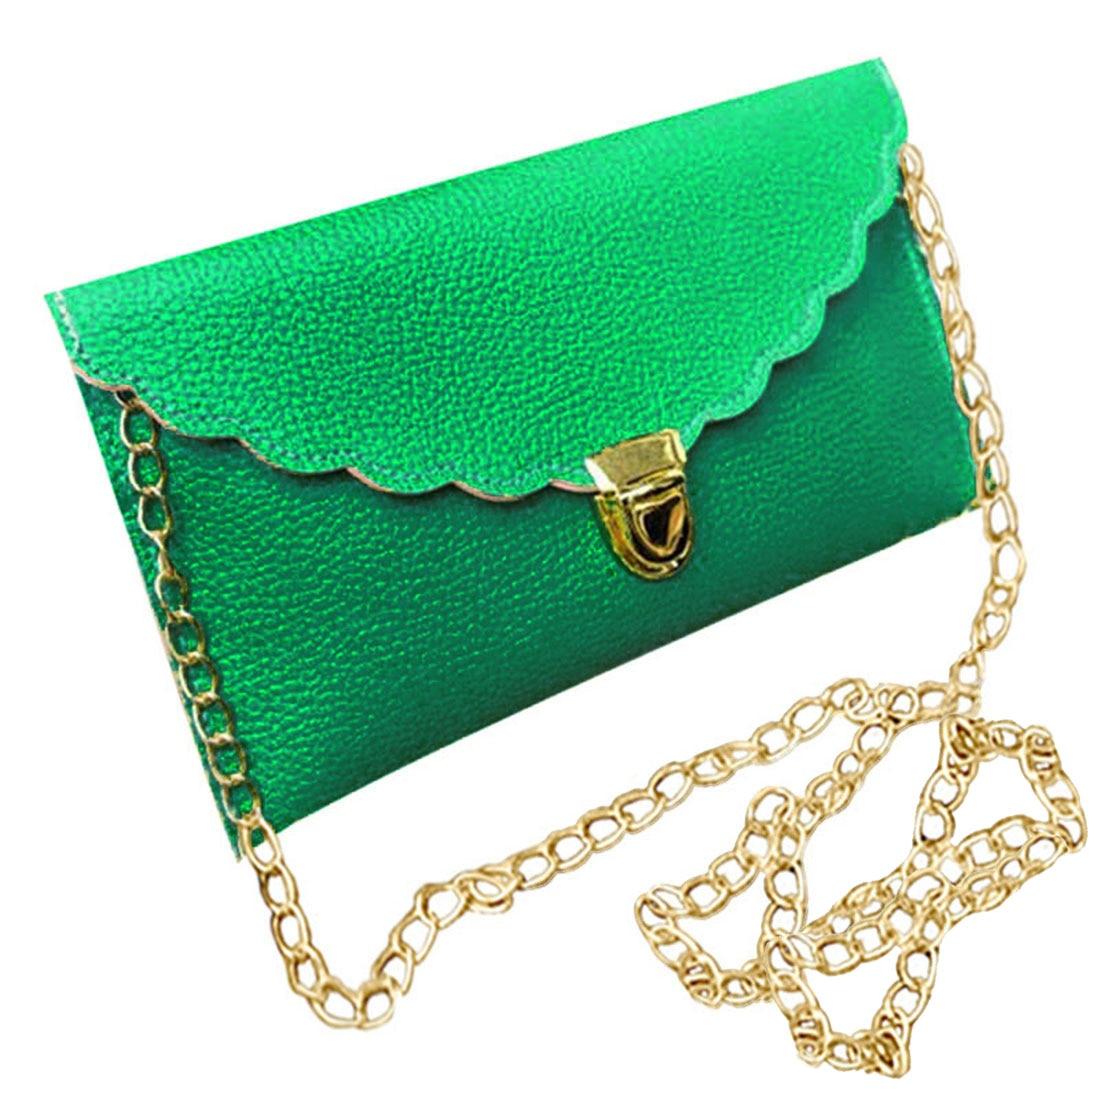 Ladies Handbag Imitation Leather Shoulder Bag Fashion Wallet Long Metal Chain Lady Handbag, Green handbag 2018 new wallet european and american fashion eighty percent off ladies long wallet